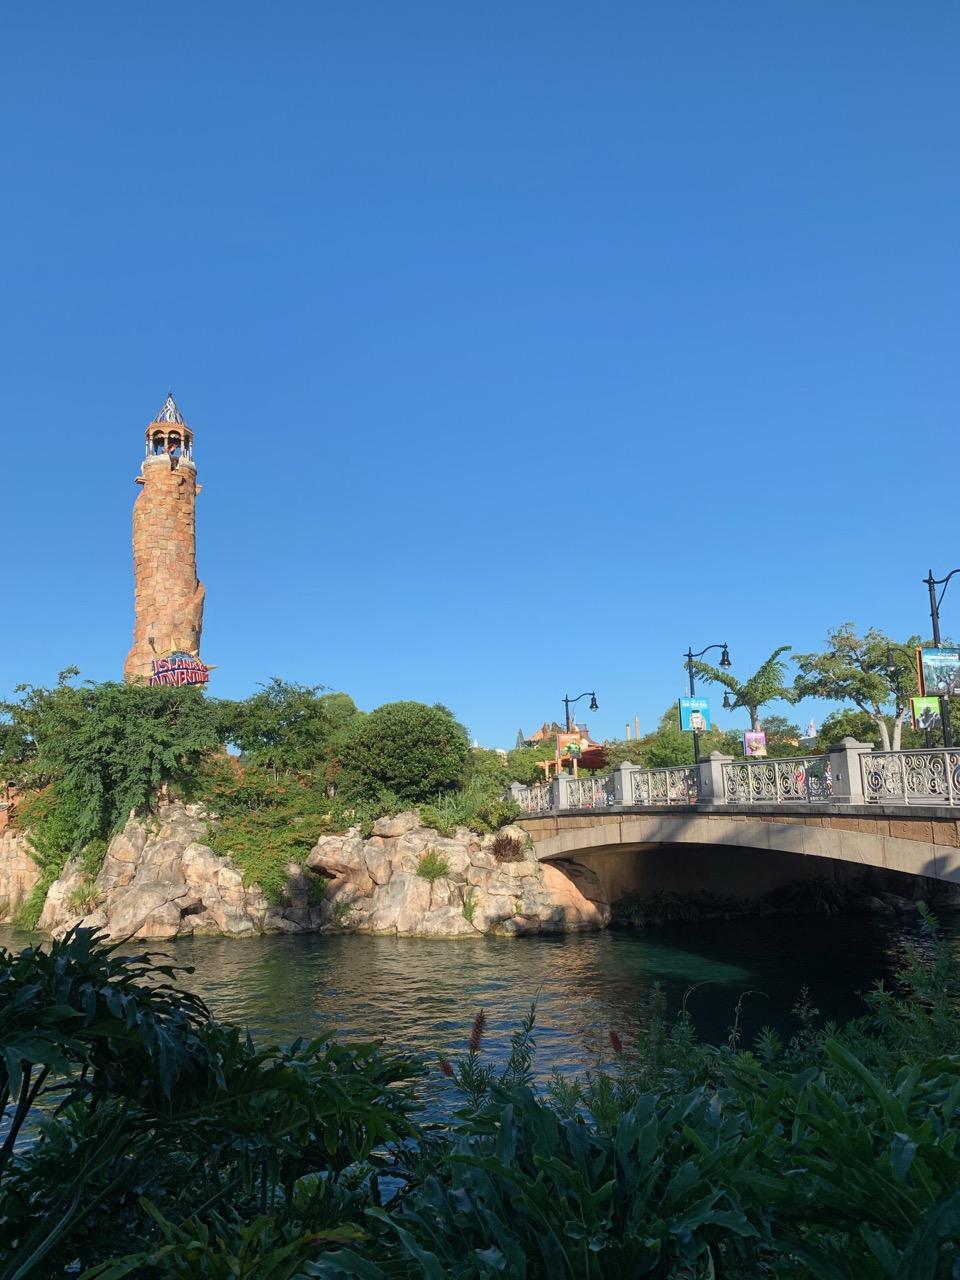 universal studios orlando trip vacation planinng guide 11 park.jpeg